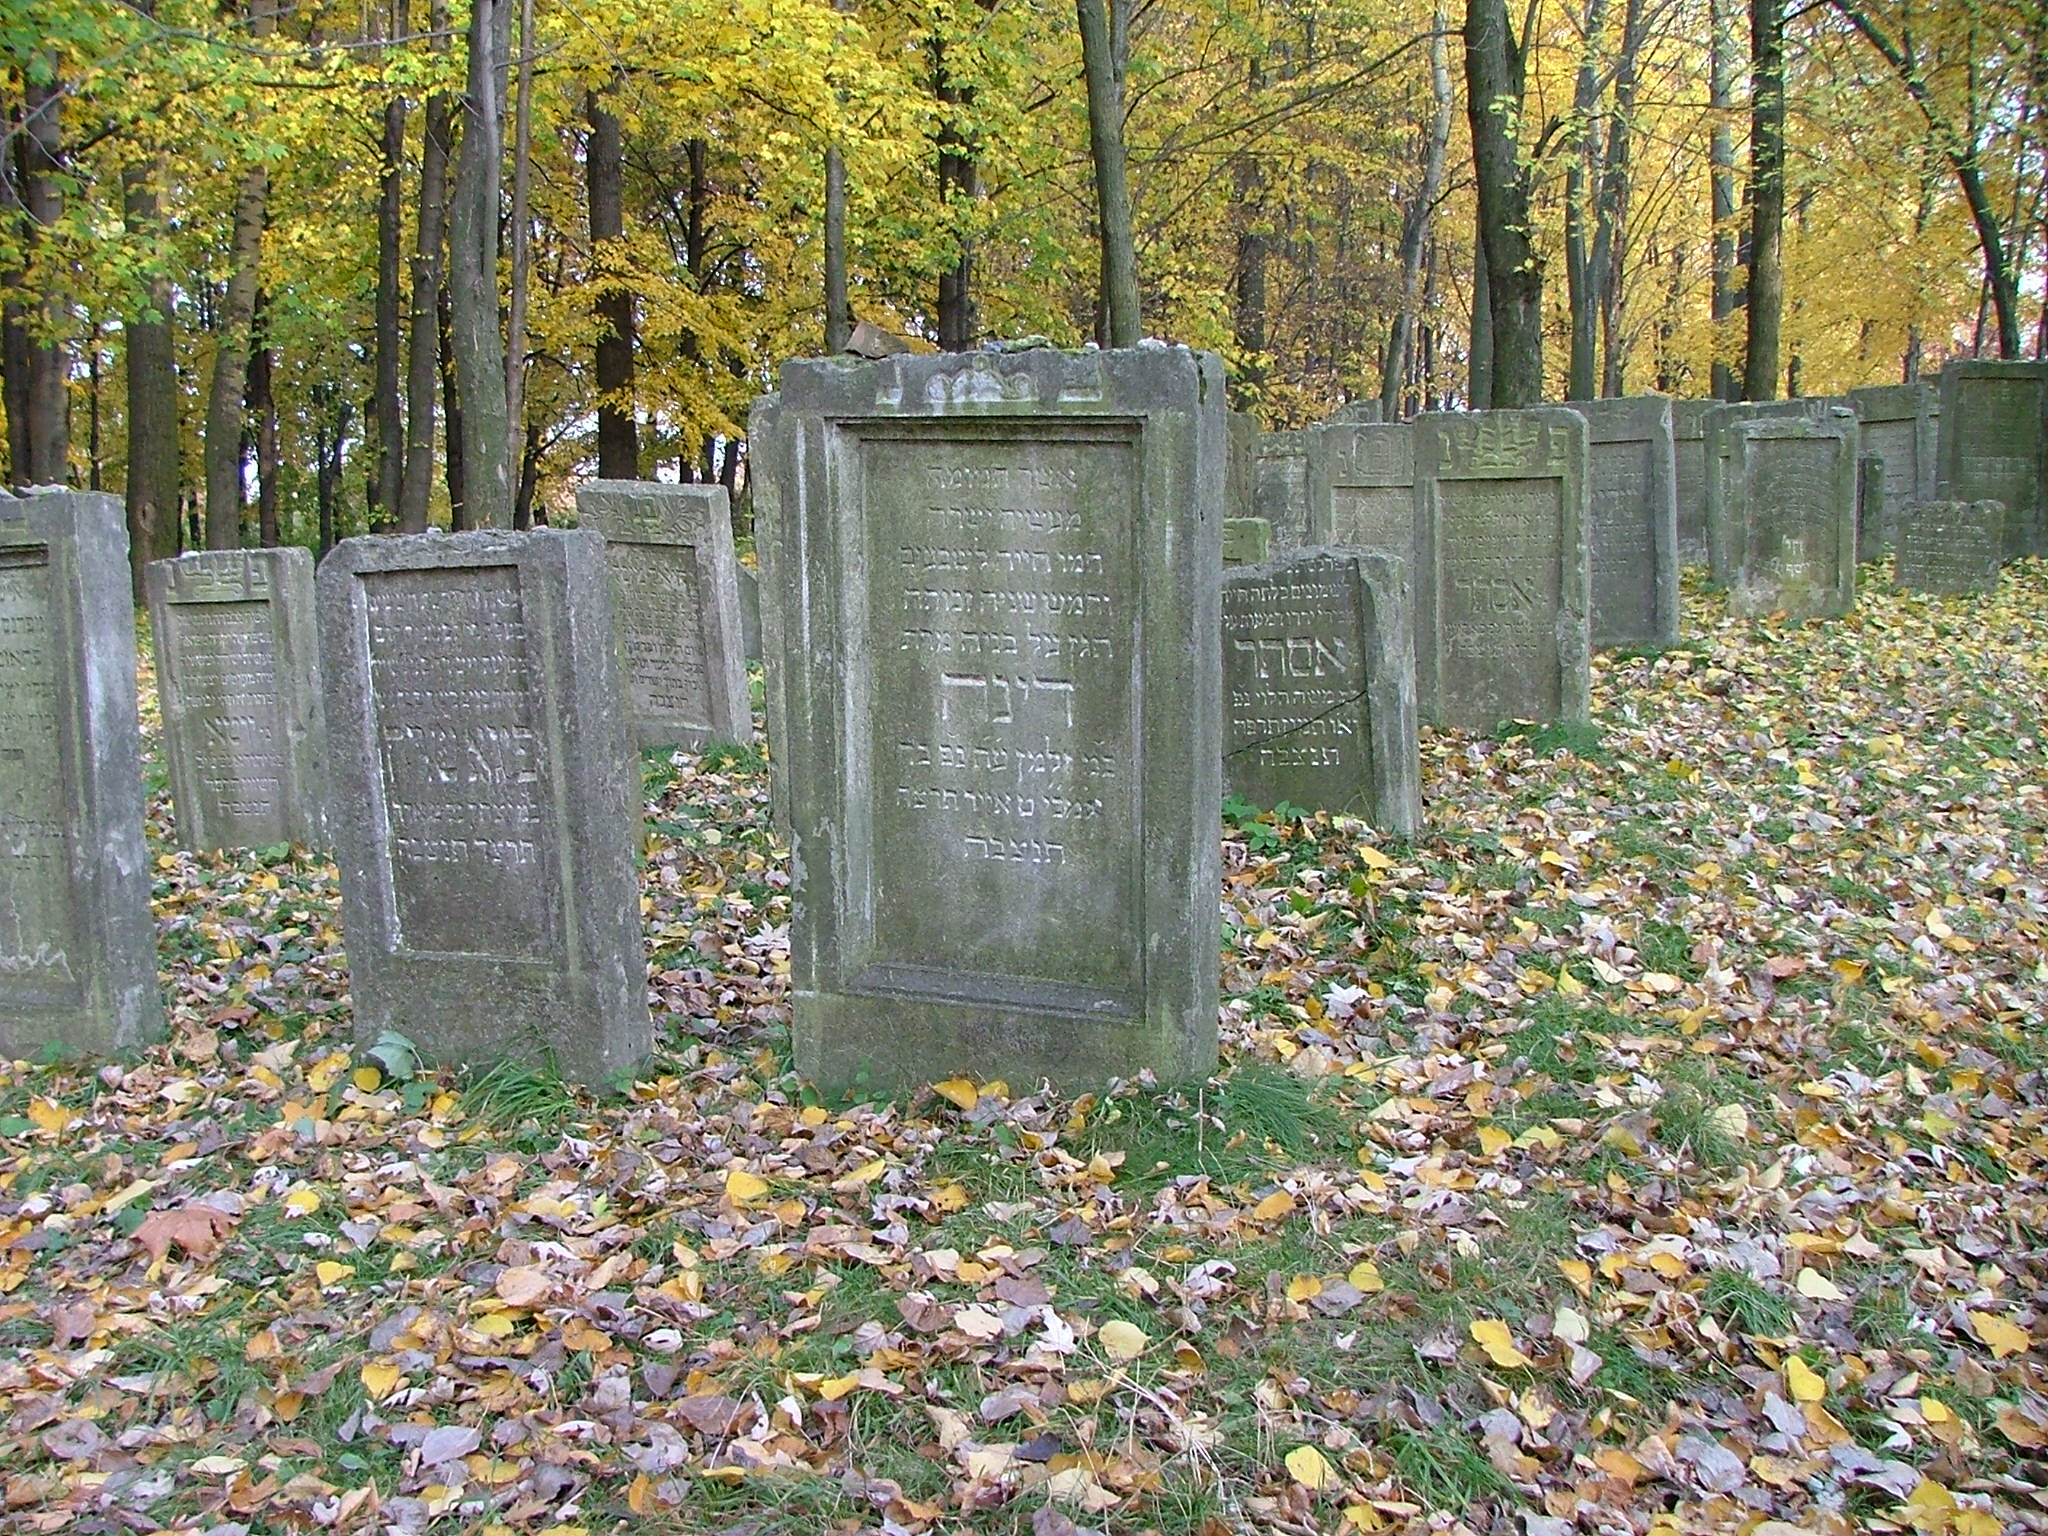 File:Jewish cemetery in Leżajsk (Poland)8.jpg - Wikimedia Commons